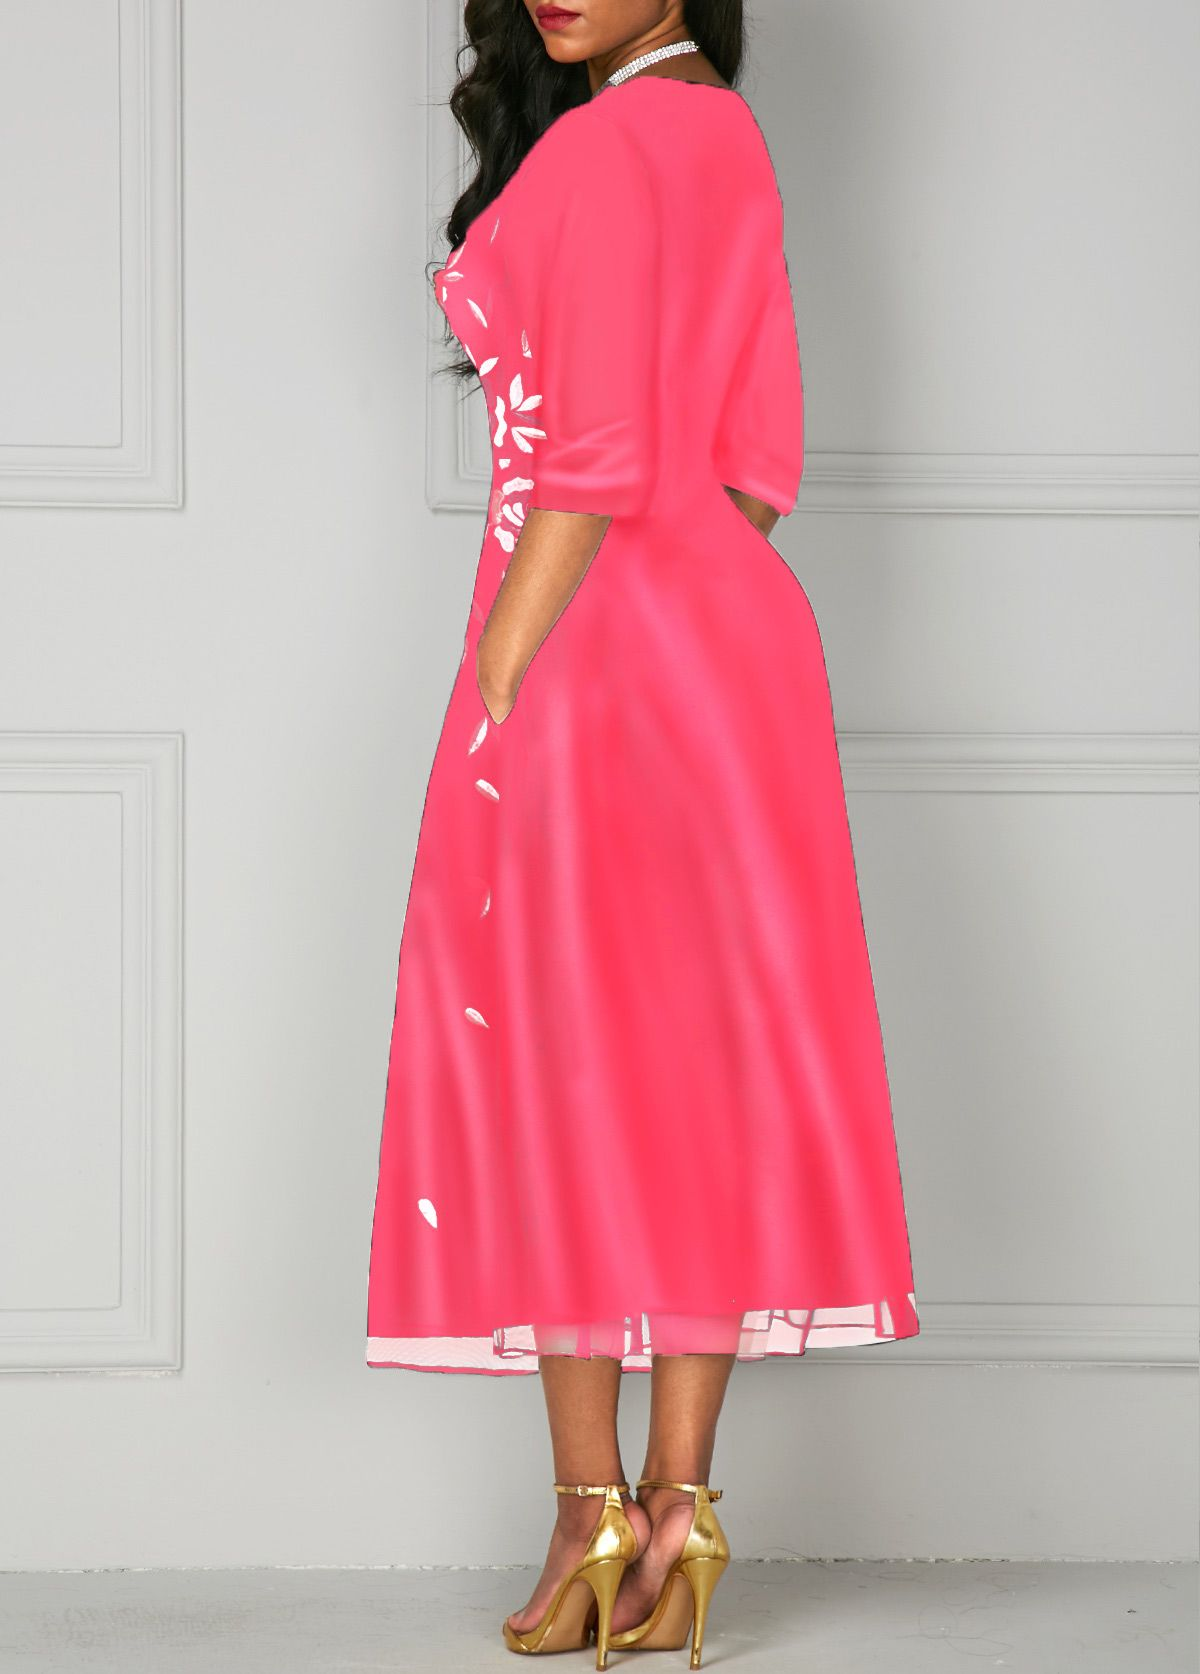 cc751aa6da3 Deep V Neck Pocket Flower Print Dress